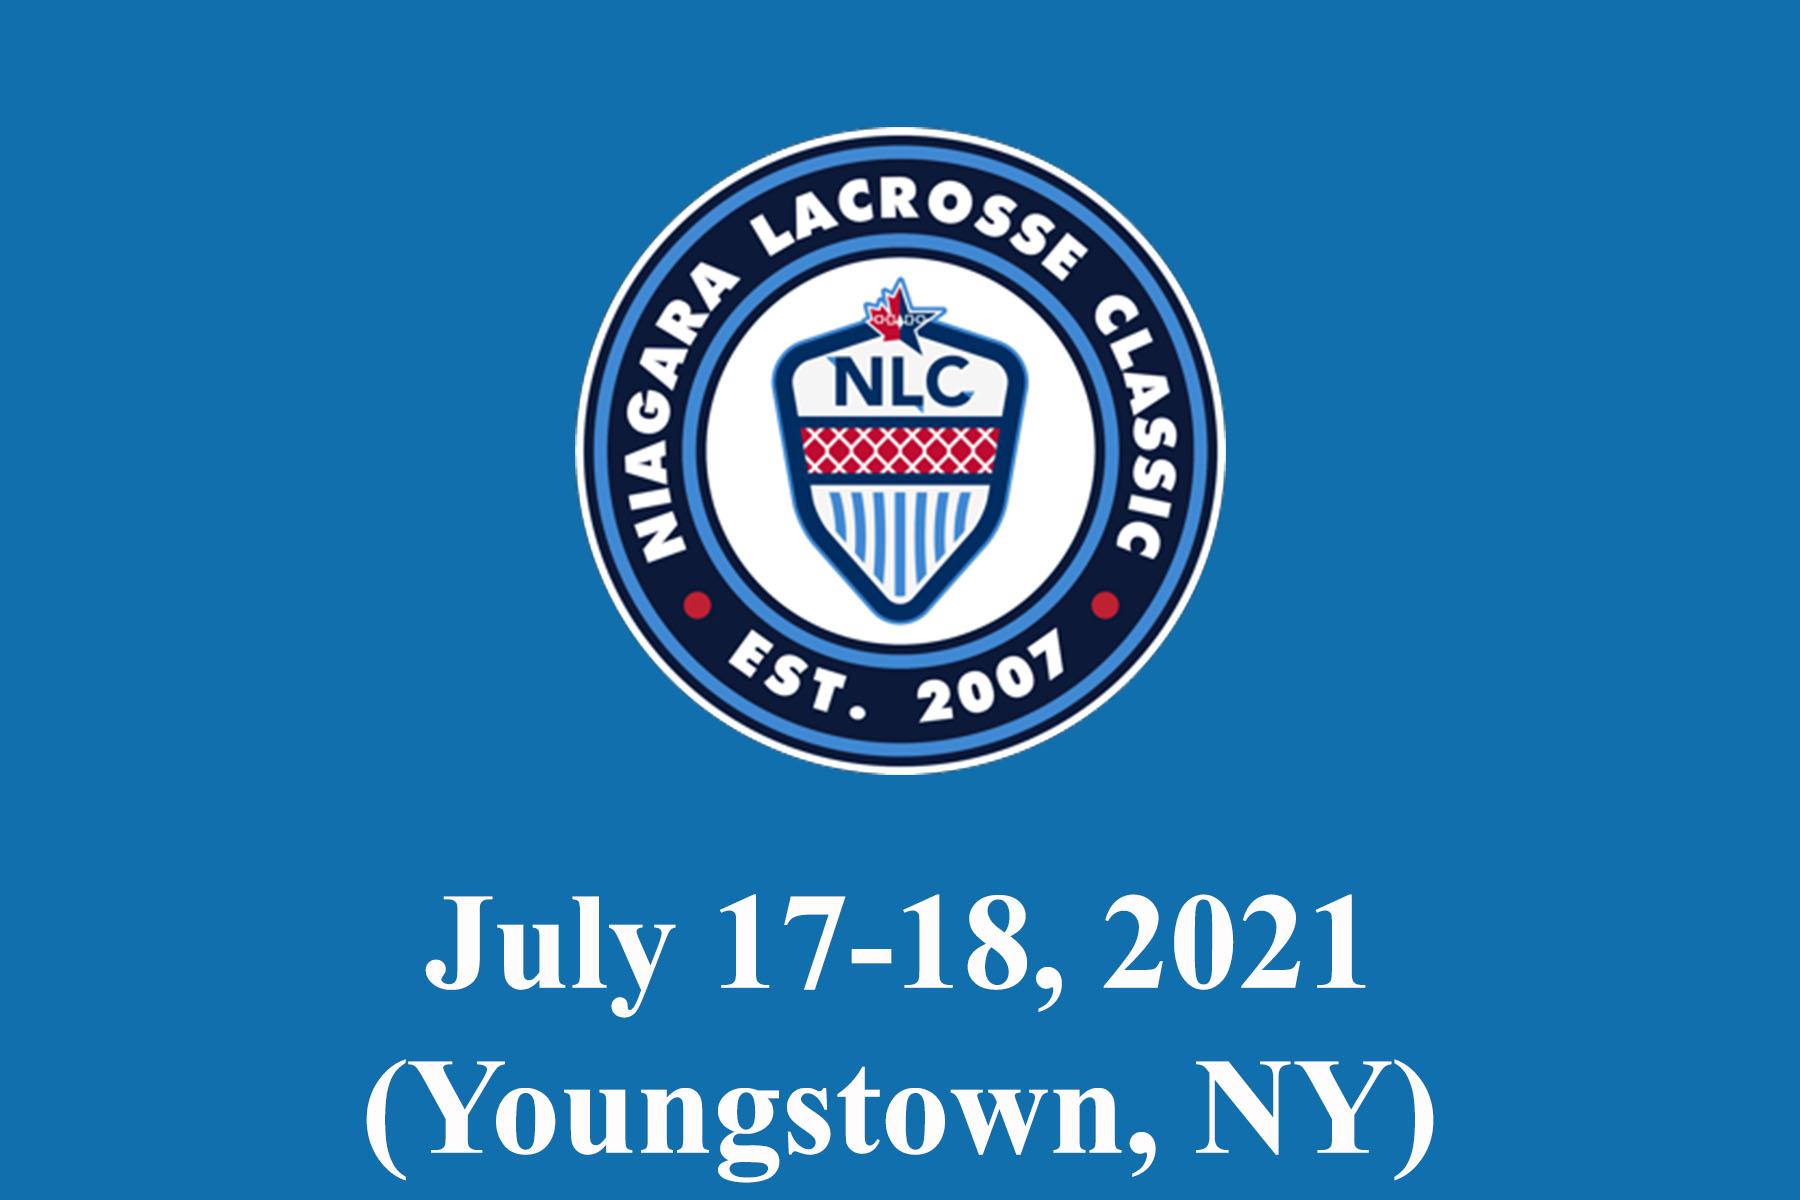 2021 Niagara Lacrosse Classic